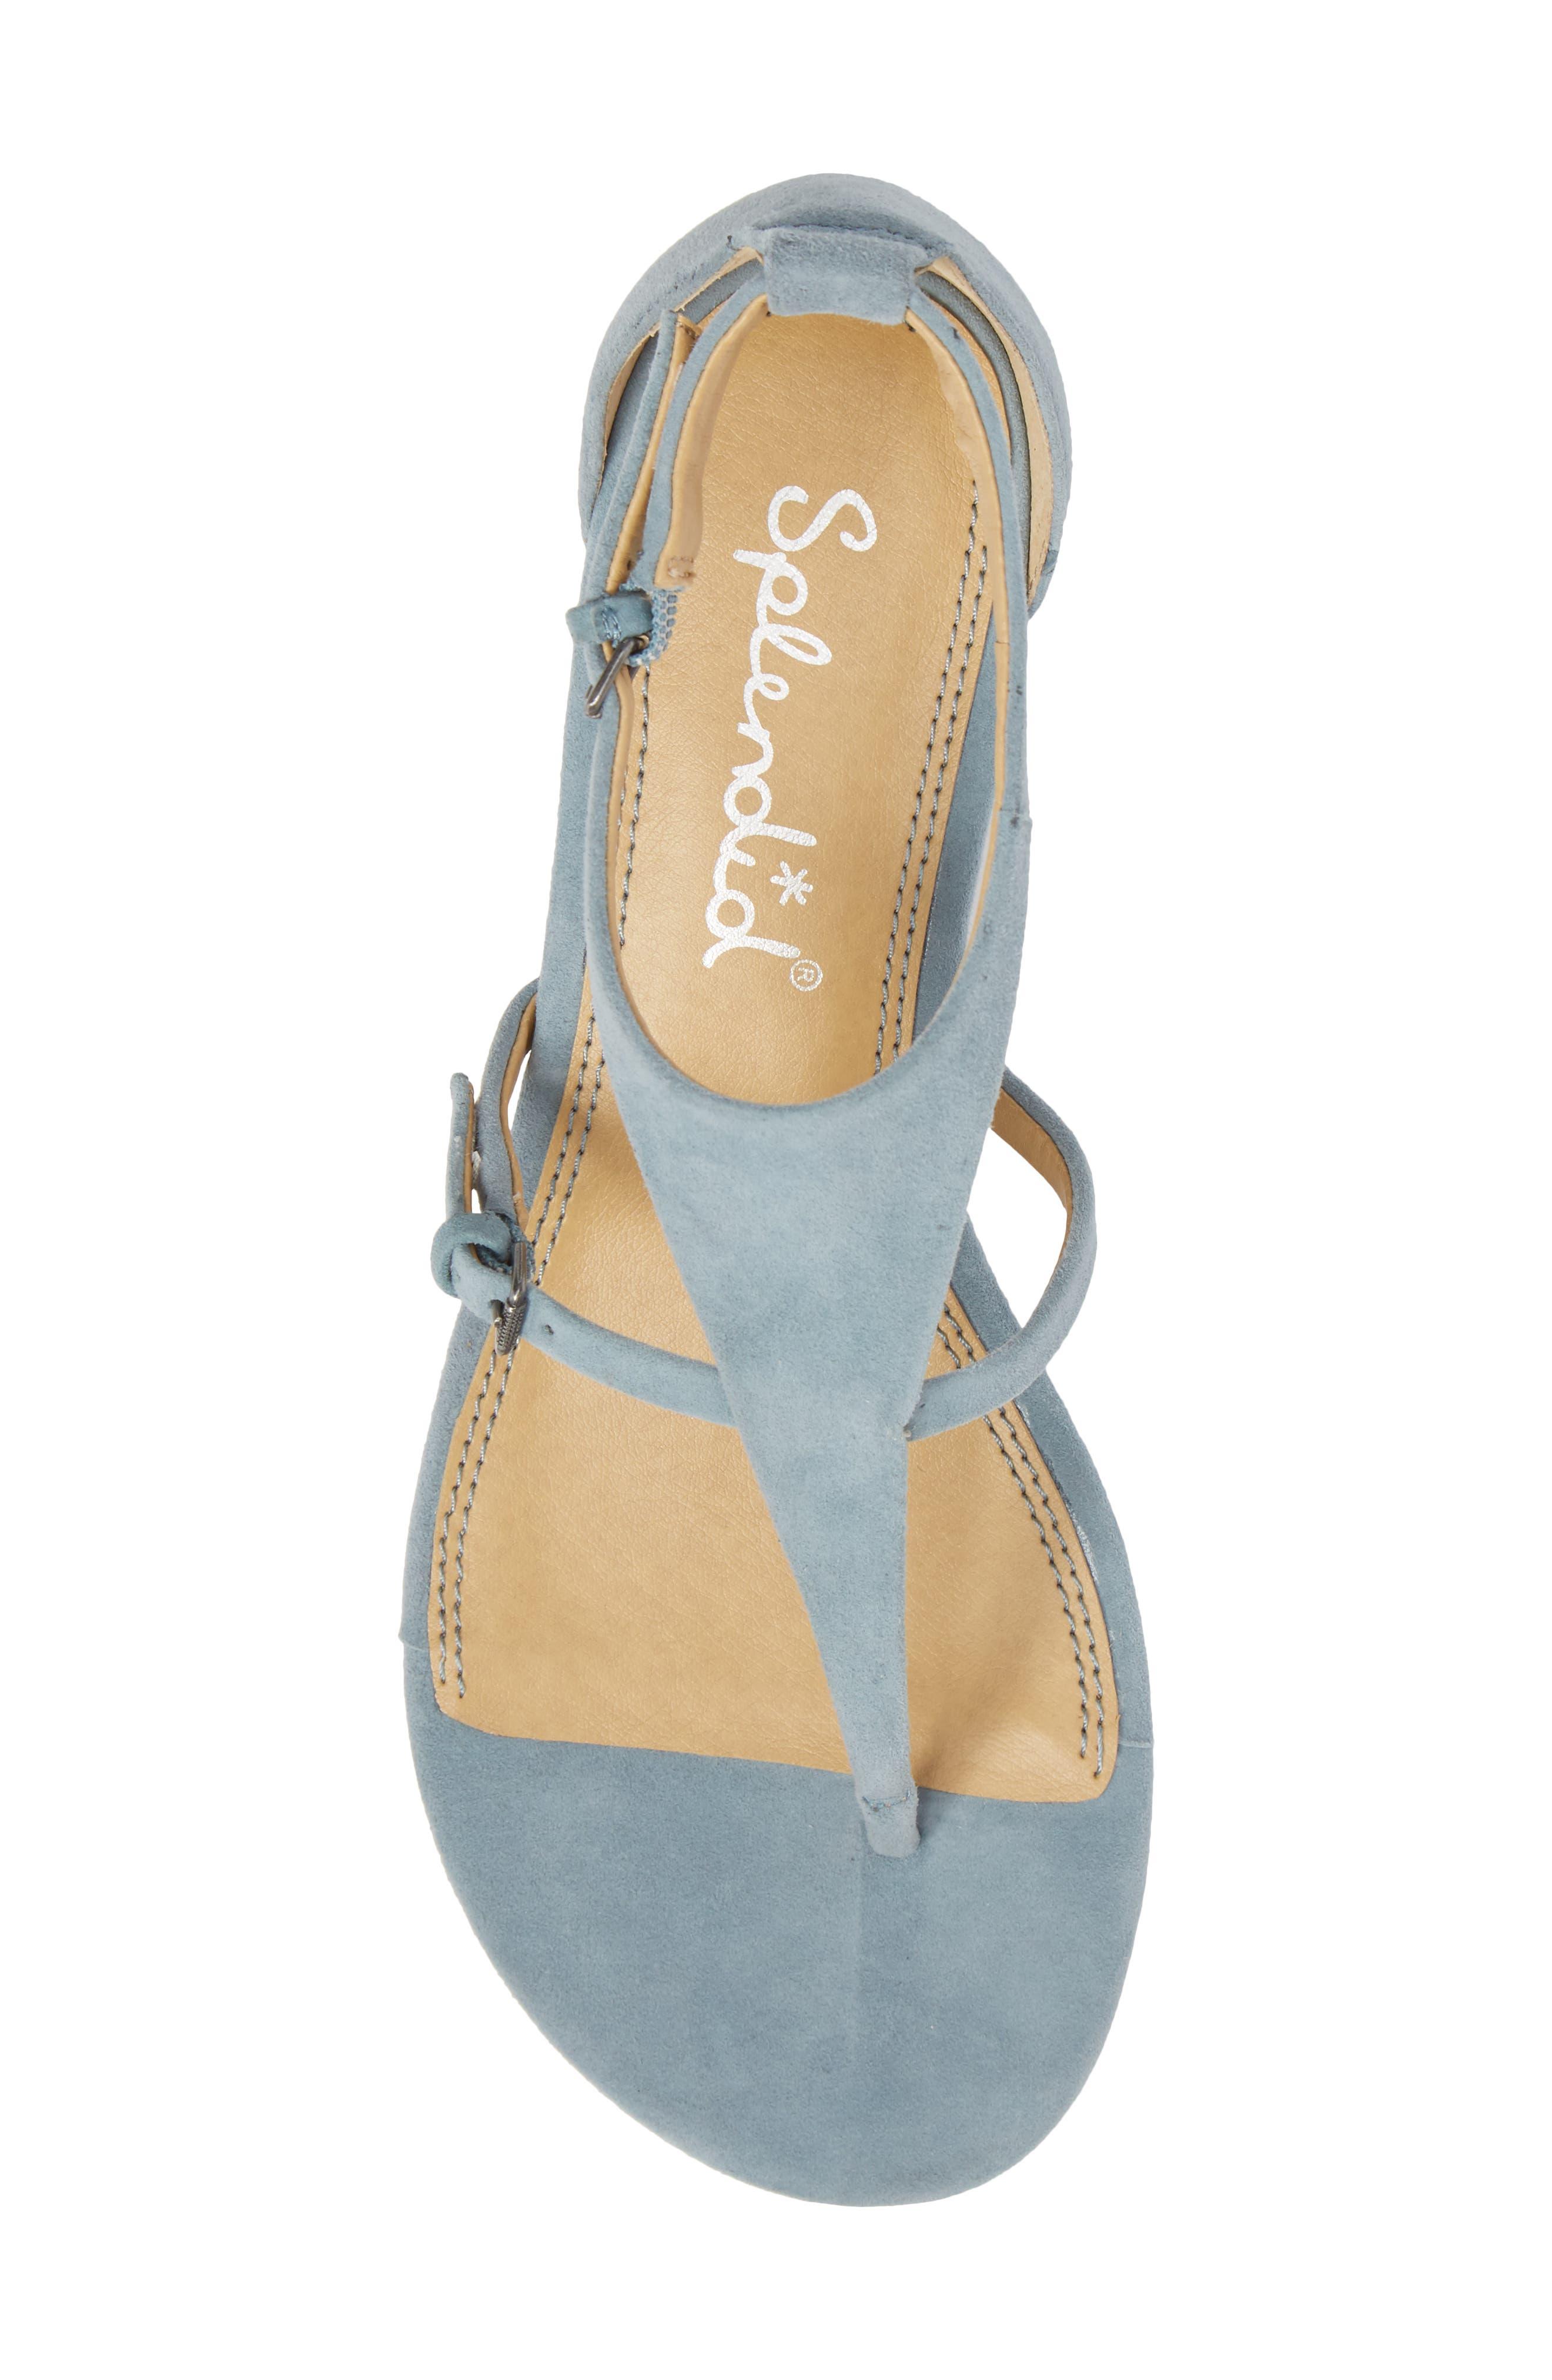 Brooklyn V-Strap Wedge Sandal,                             Alternate thumbnail 20, color,